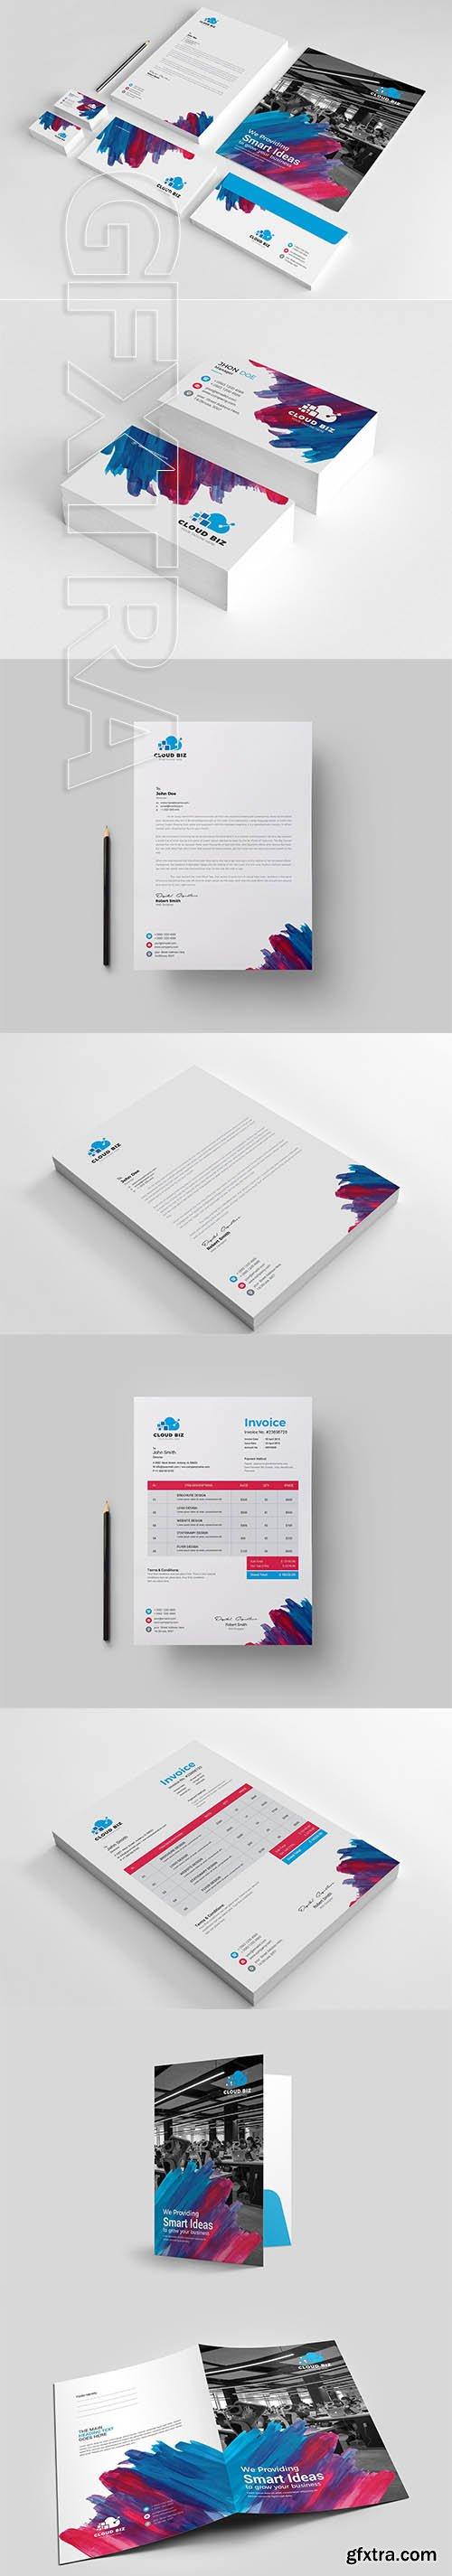 CreativeMarket - Stationery 3486328